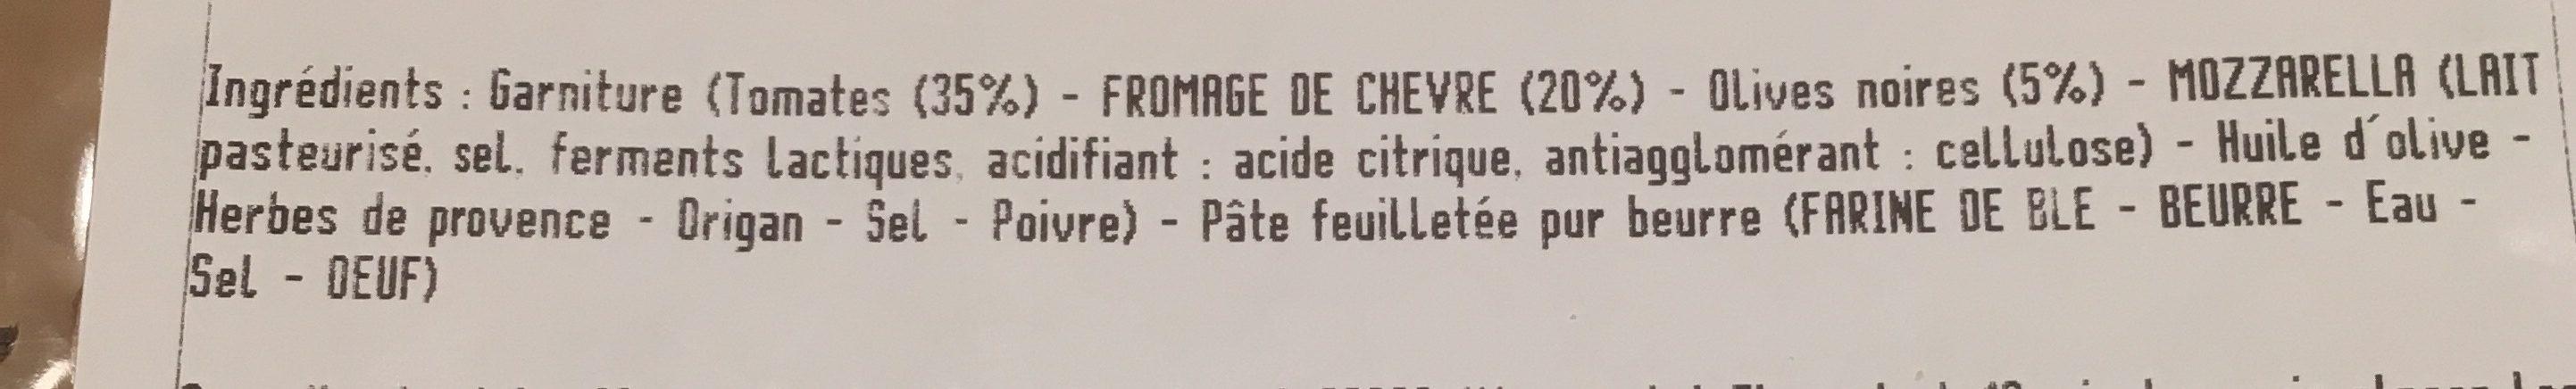 Tartes fines tomates chevre - Ingredients